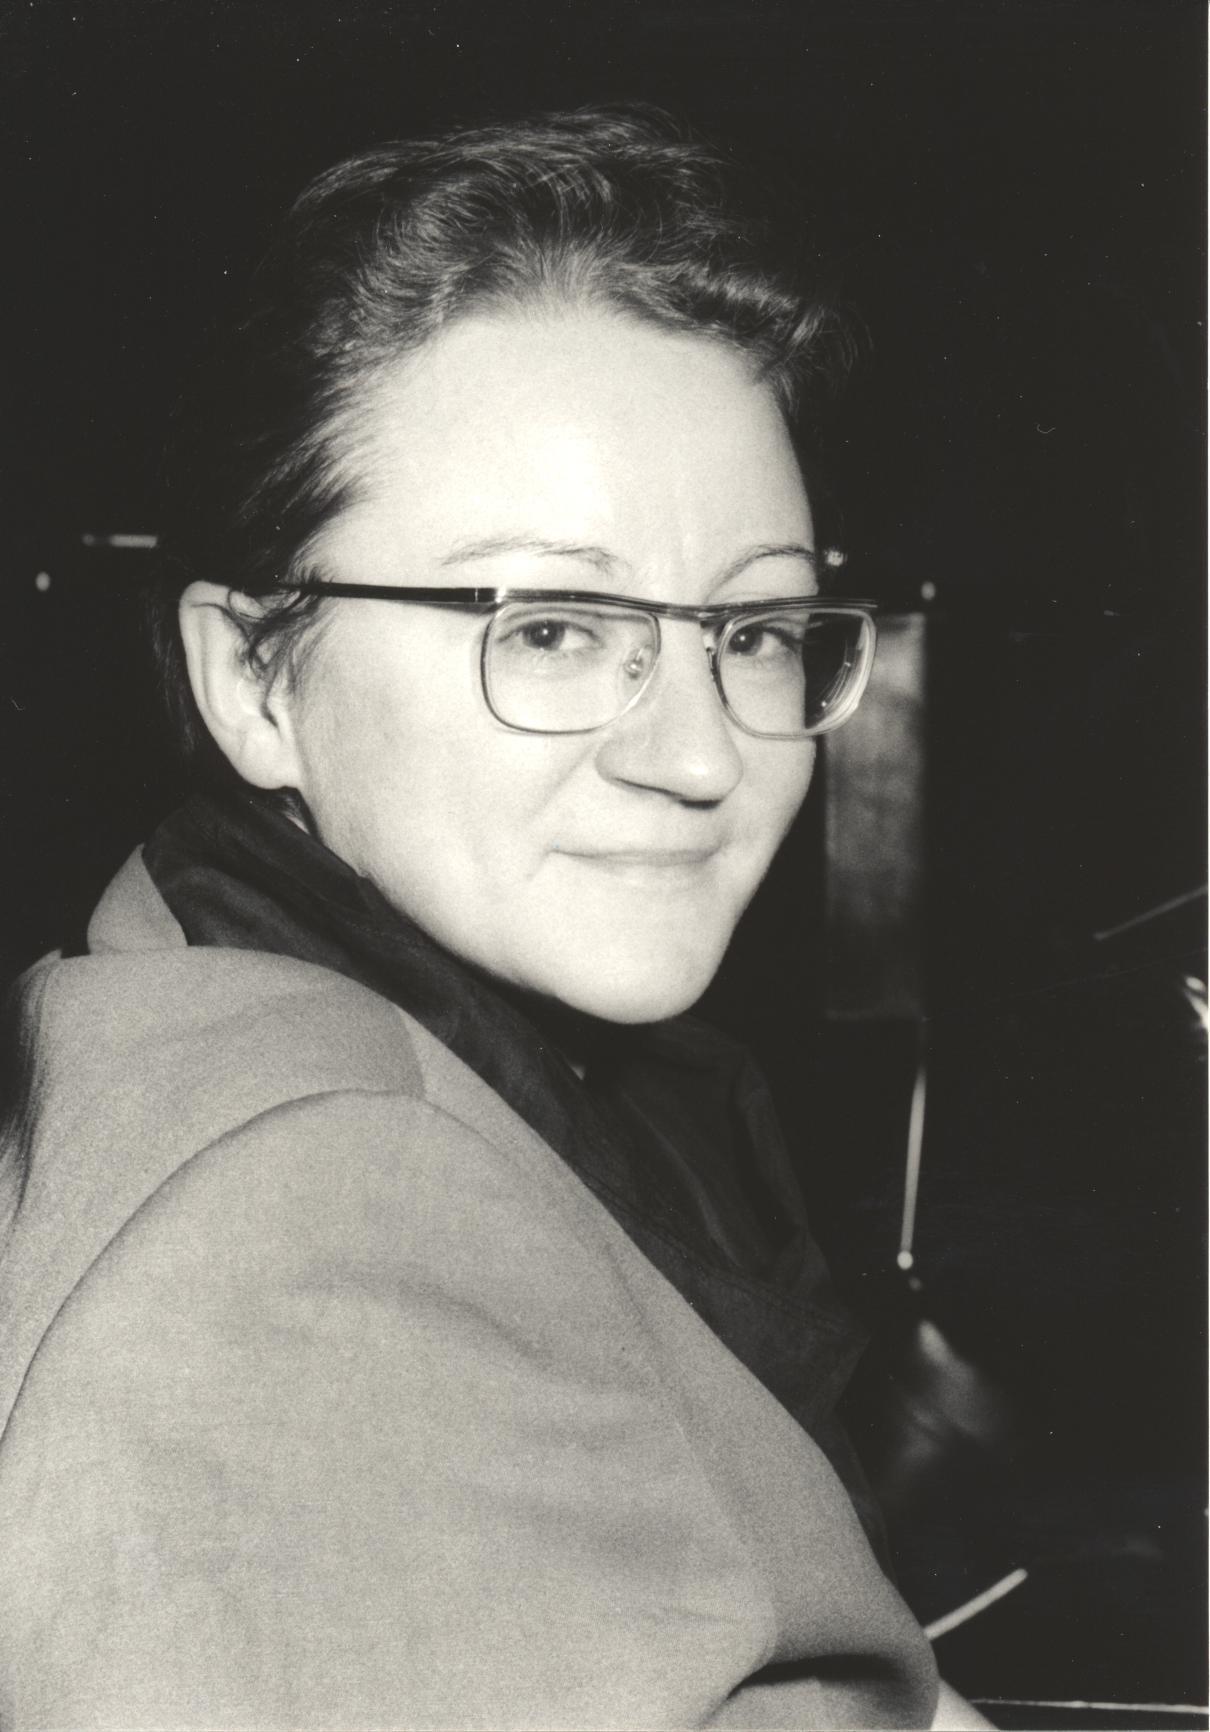 XIV. Imago Mundi-Kongress 1993, Innsbruck, Dr. Angelika Malinar